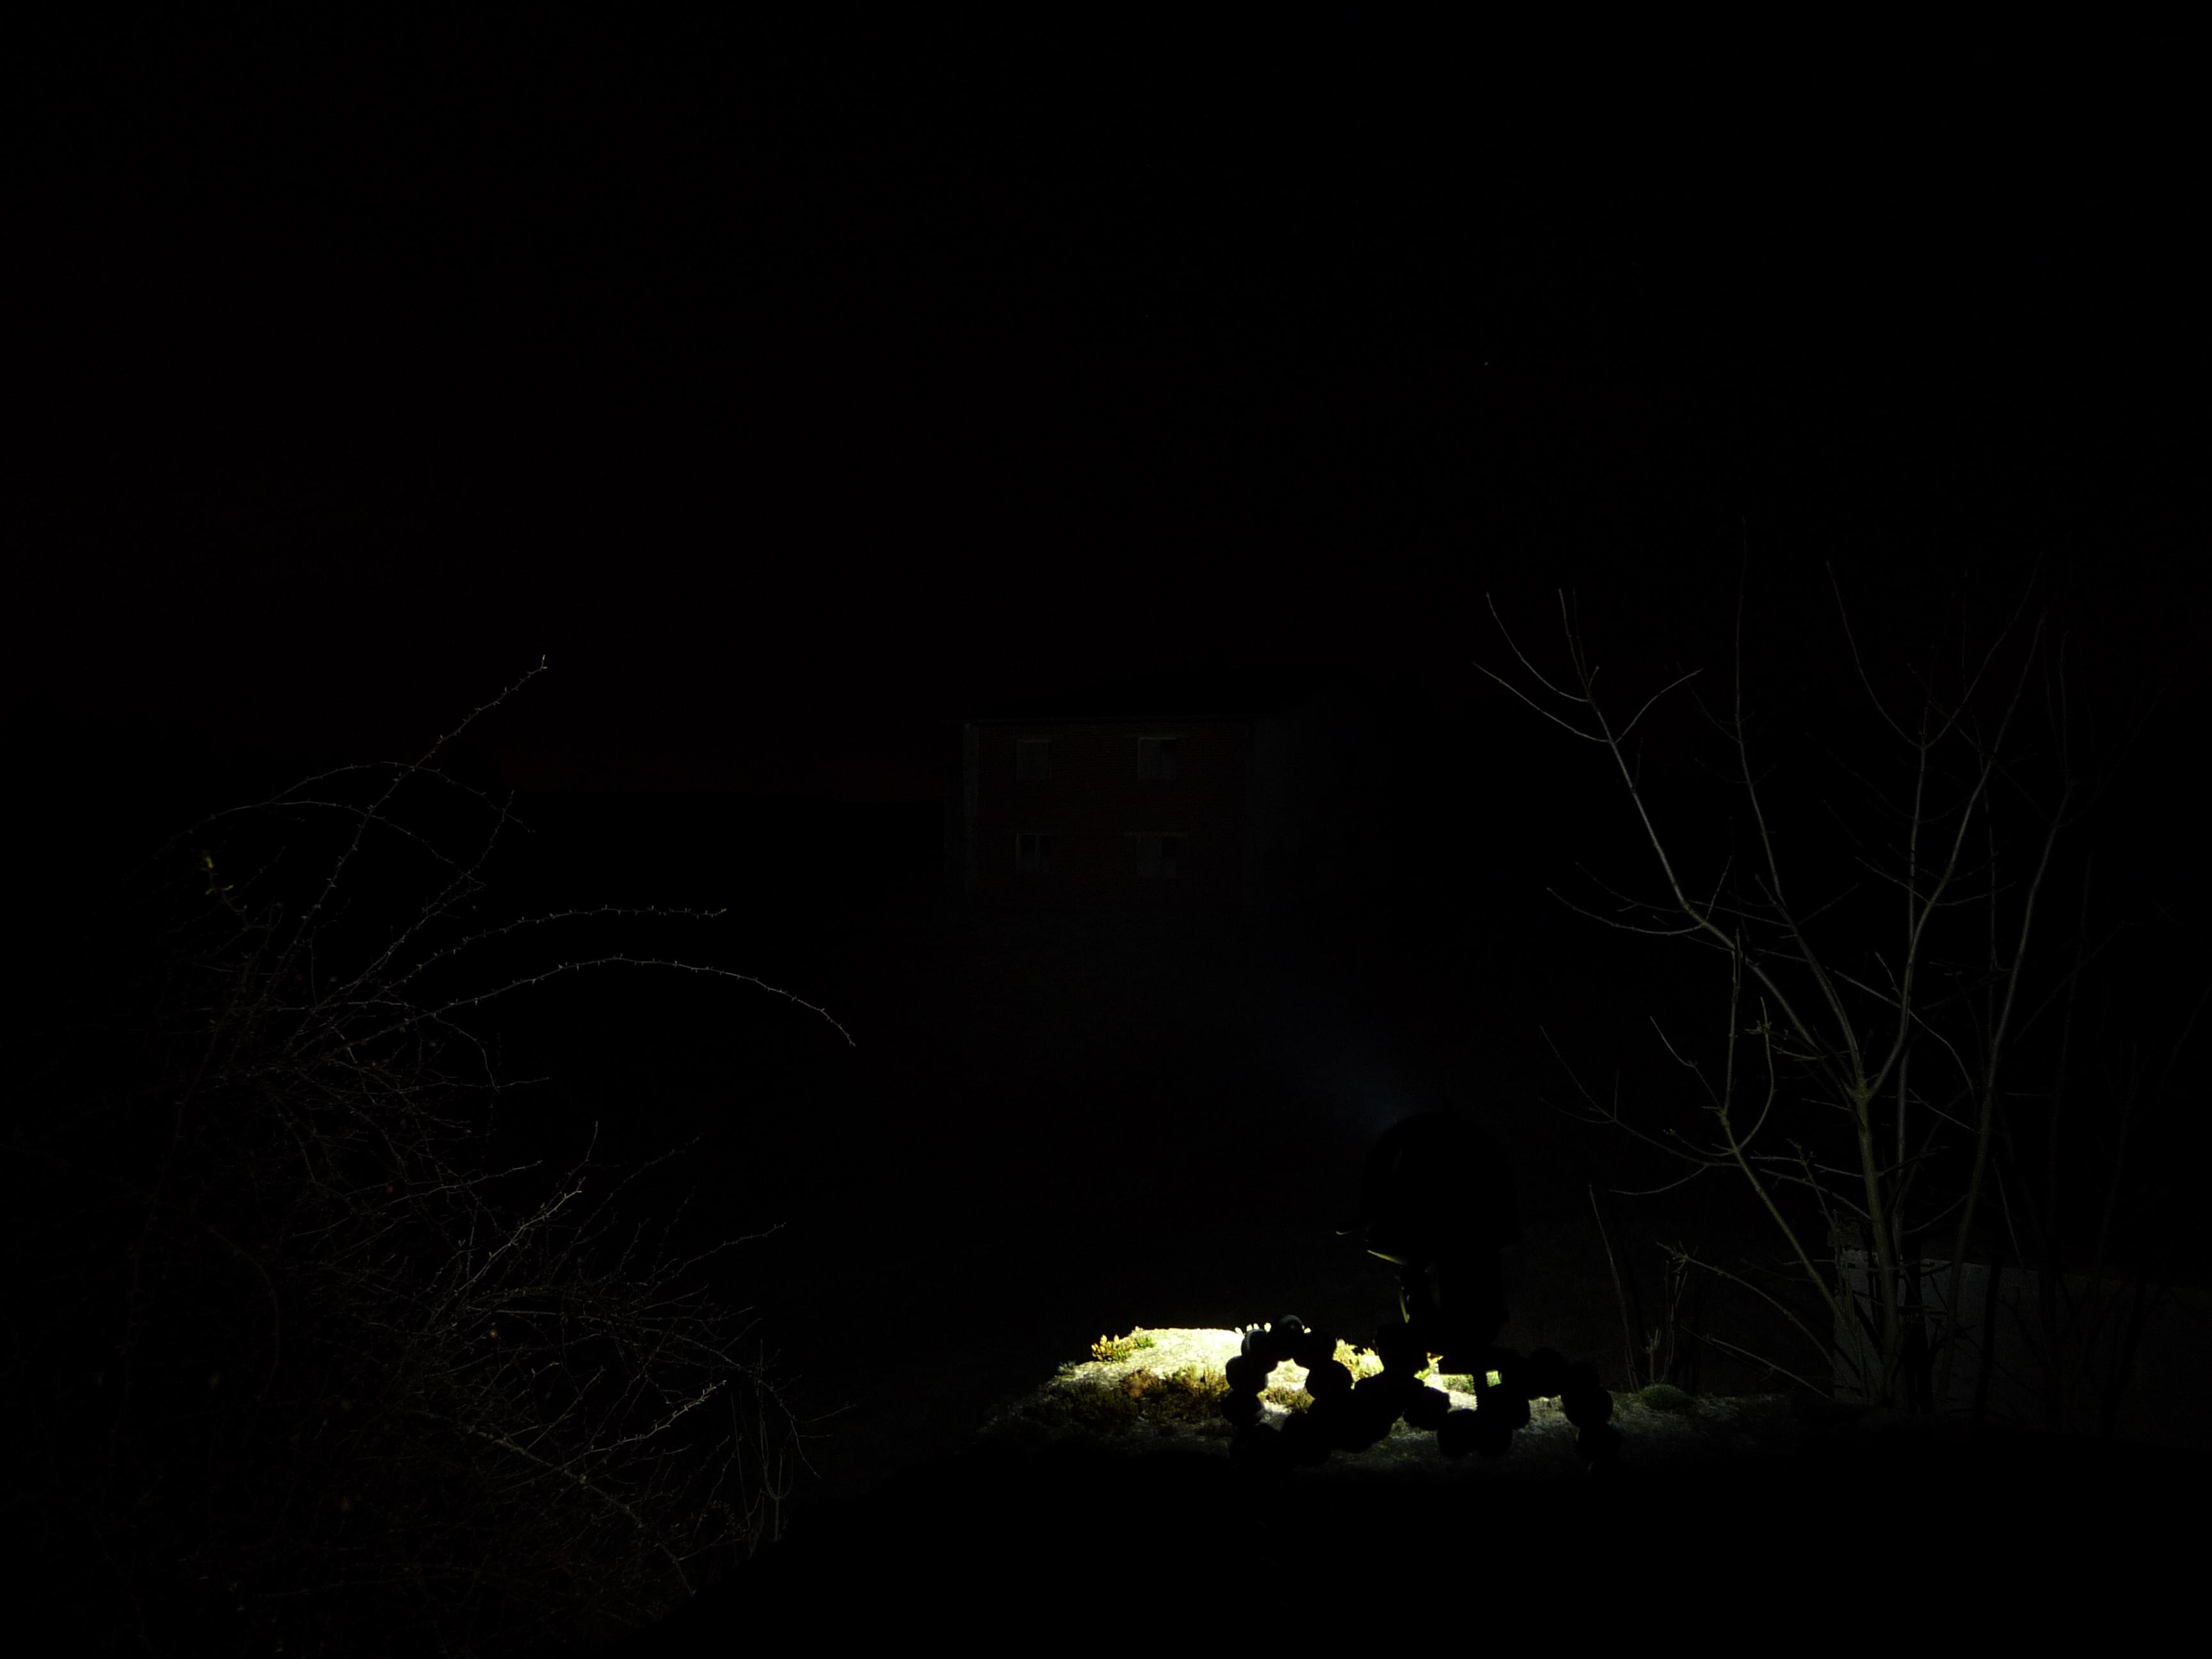 Outdor beamshots | Taschenlampen Forum